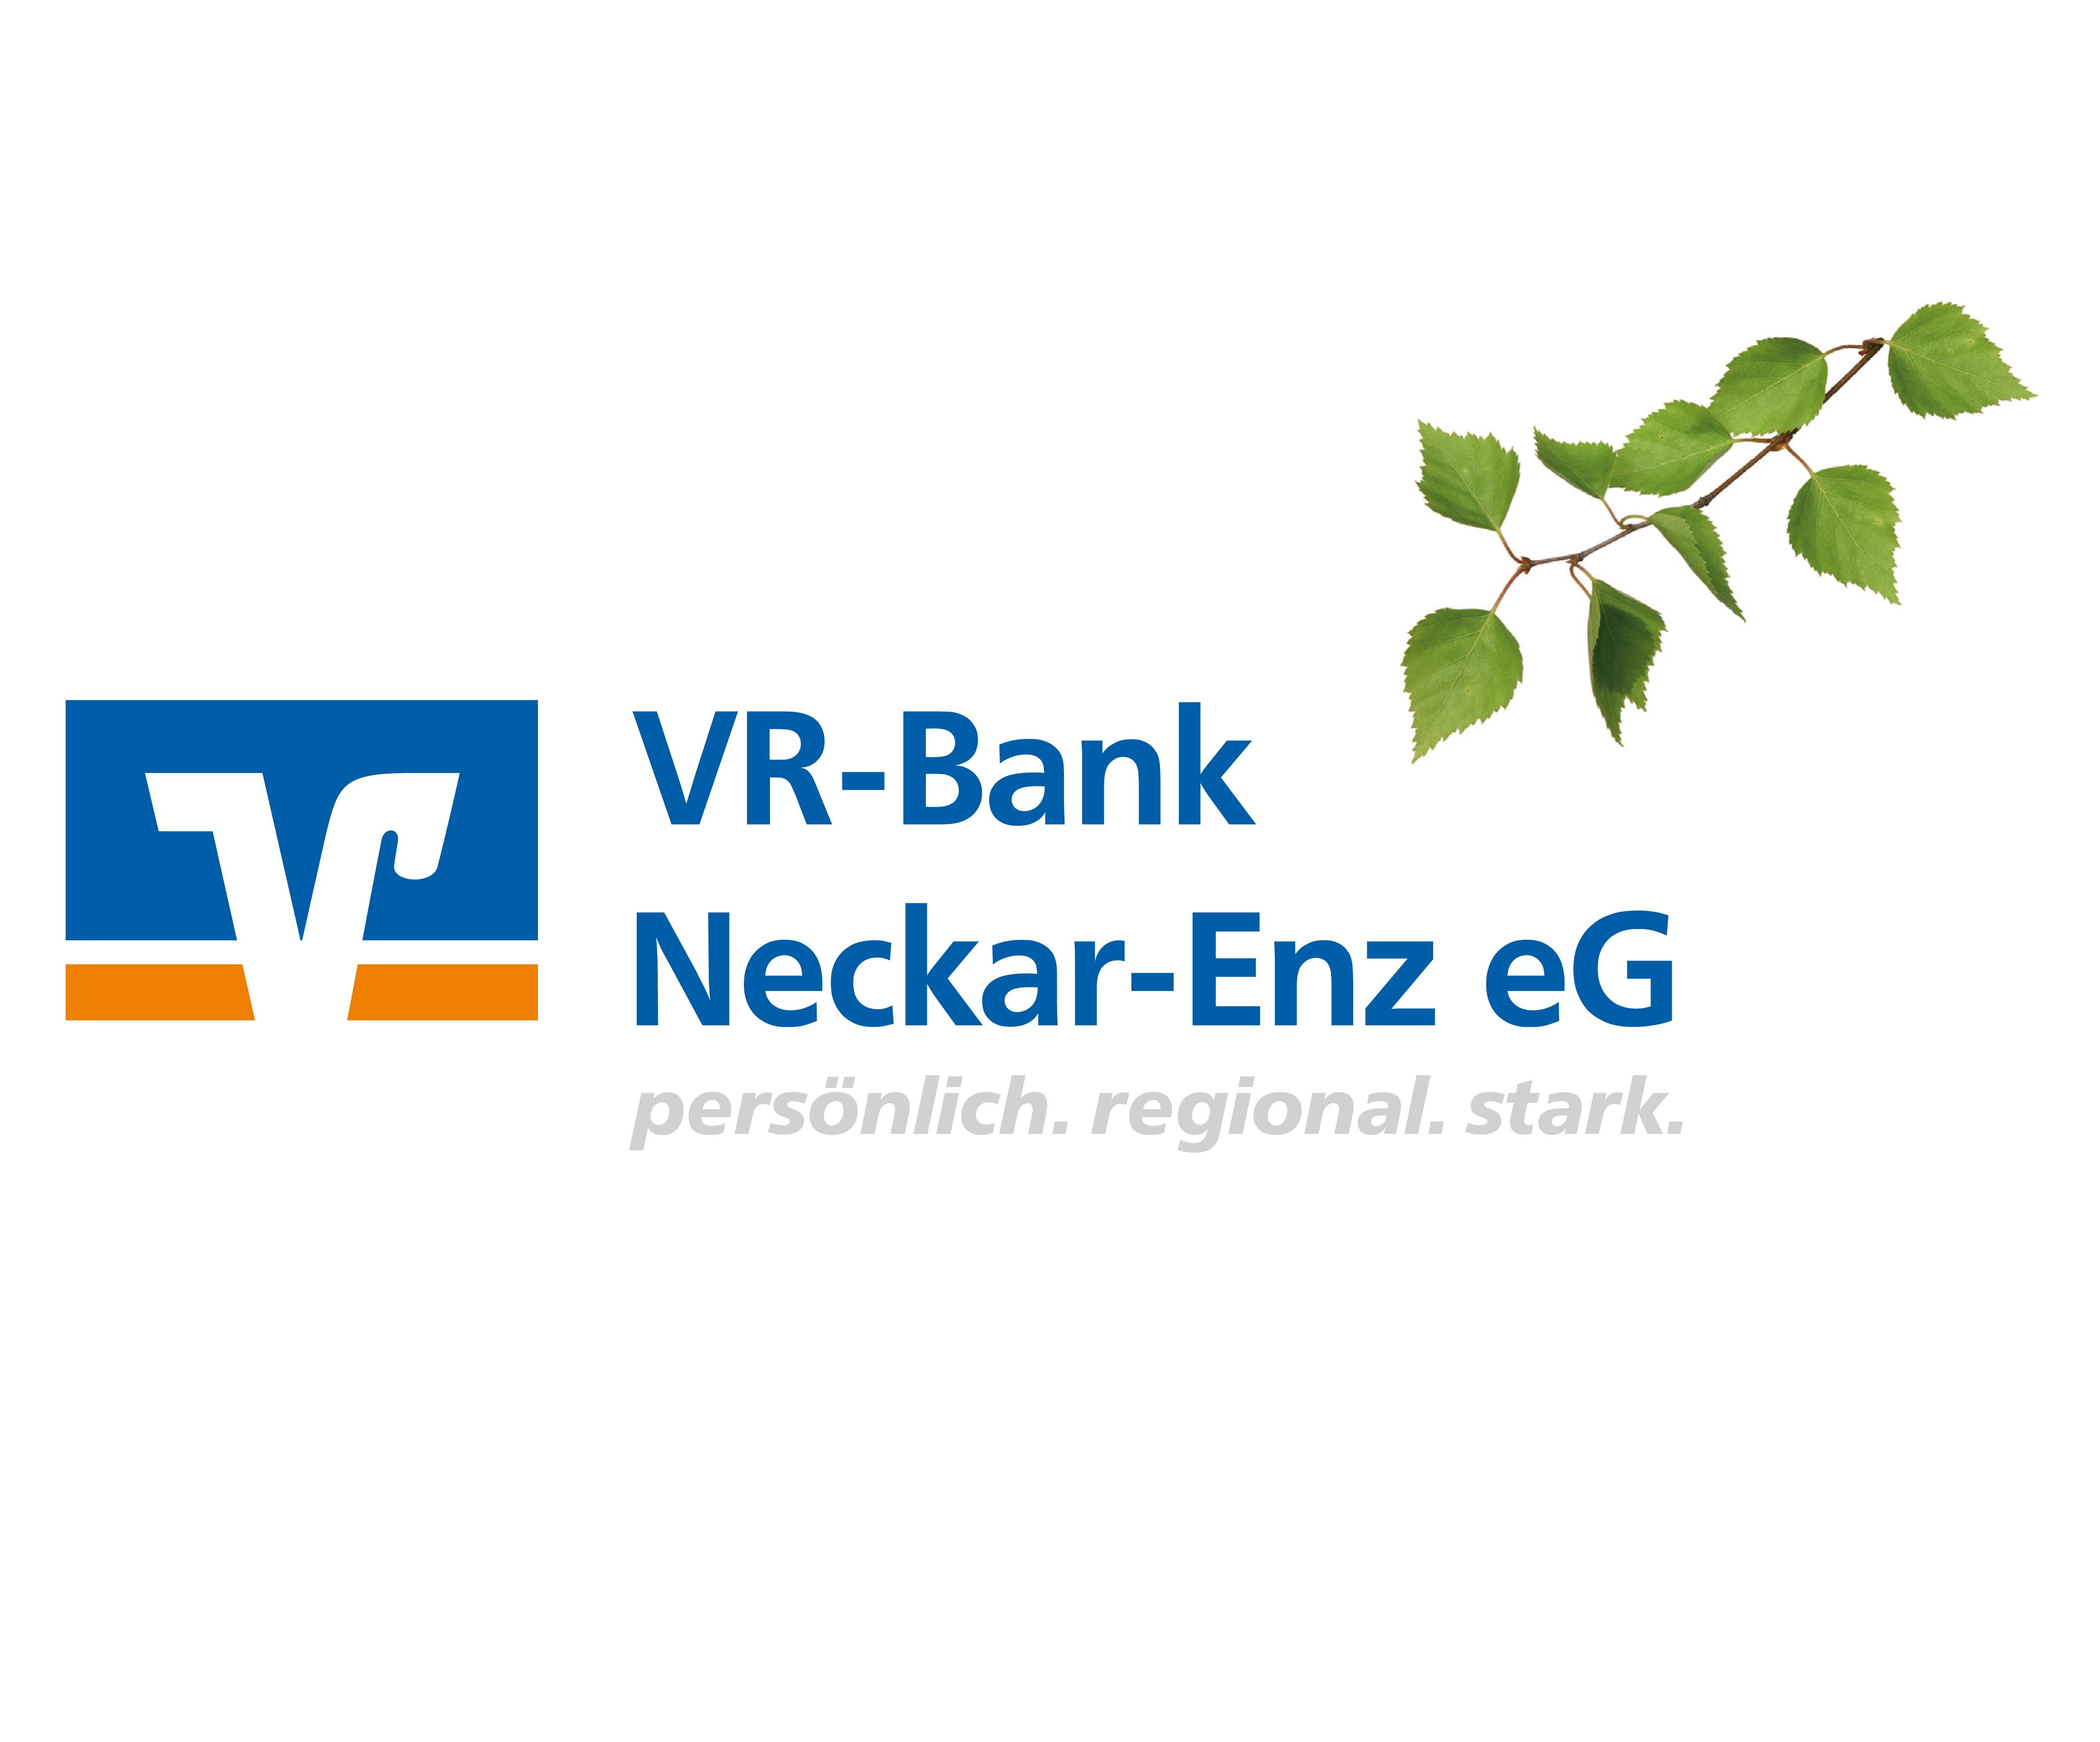 VR-Bank Neckar-Enz eG, Filiale Hohenhaslach